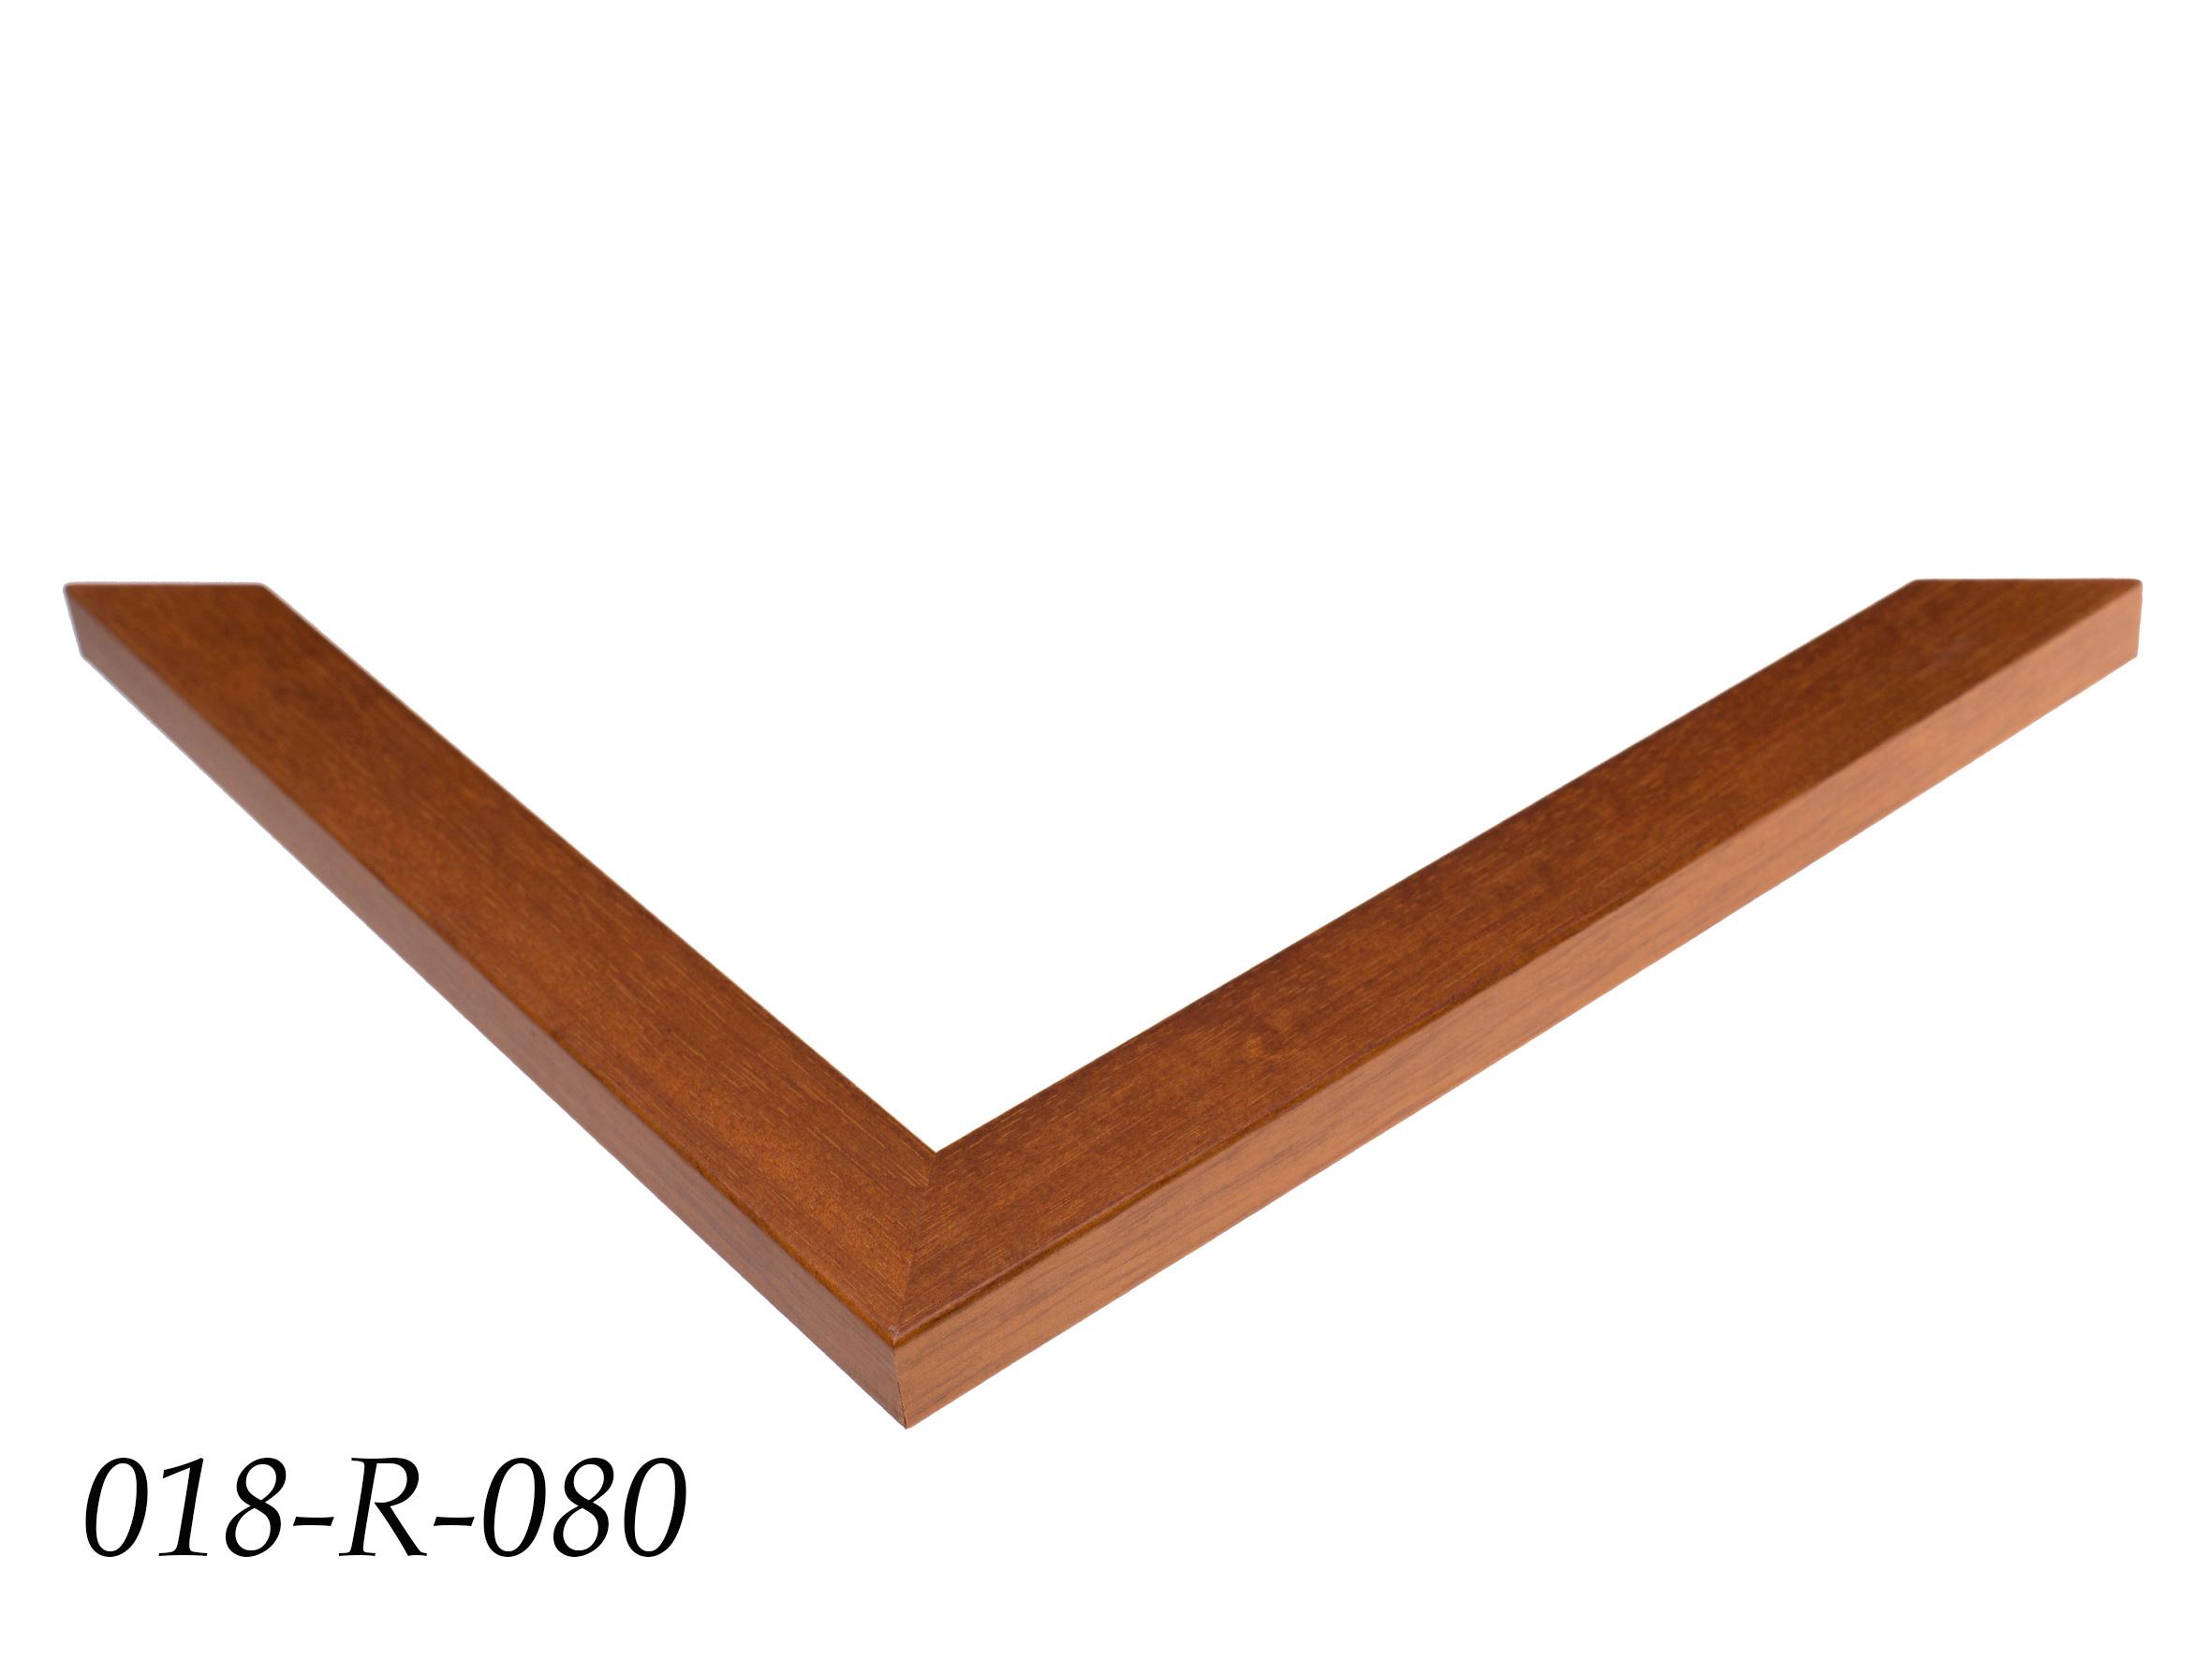 018-R-080